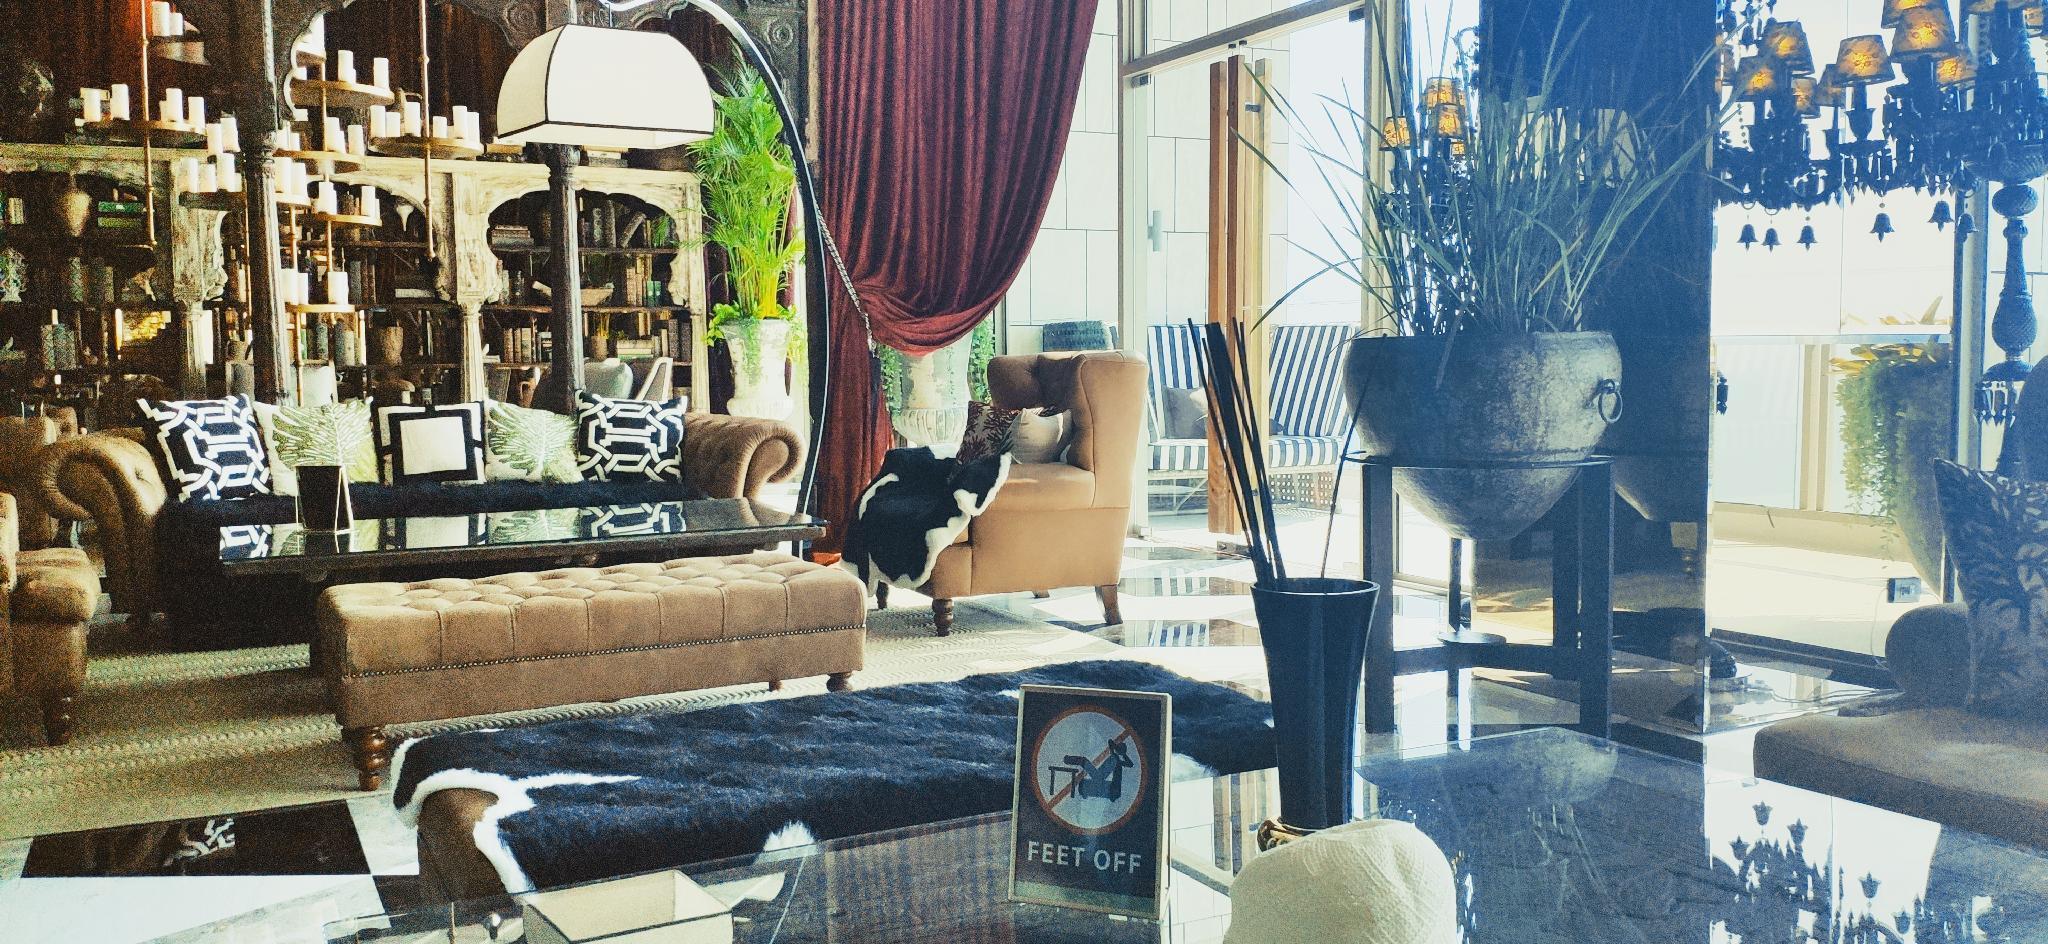 Jomtien Riviera Five Star  Seaview Apartment 30 อพาร์ตเมนต์ 1 ห้องนอน 1 ห้องน้ำส่วนตัว ขนาด 35 ตร.ม. – หาดจอมเทียน